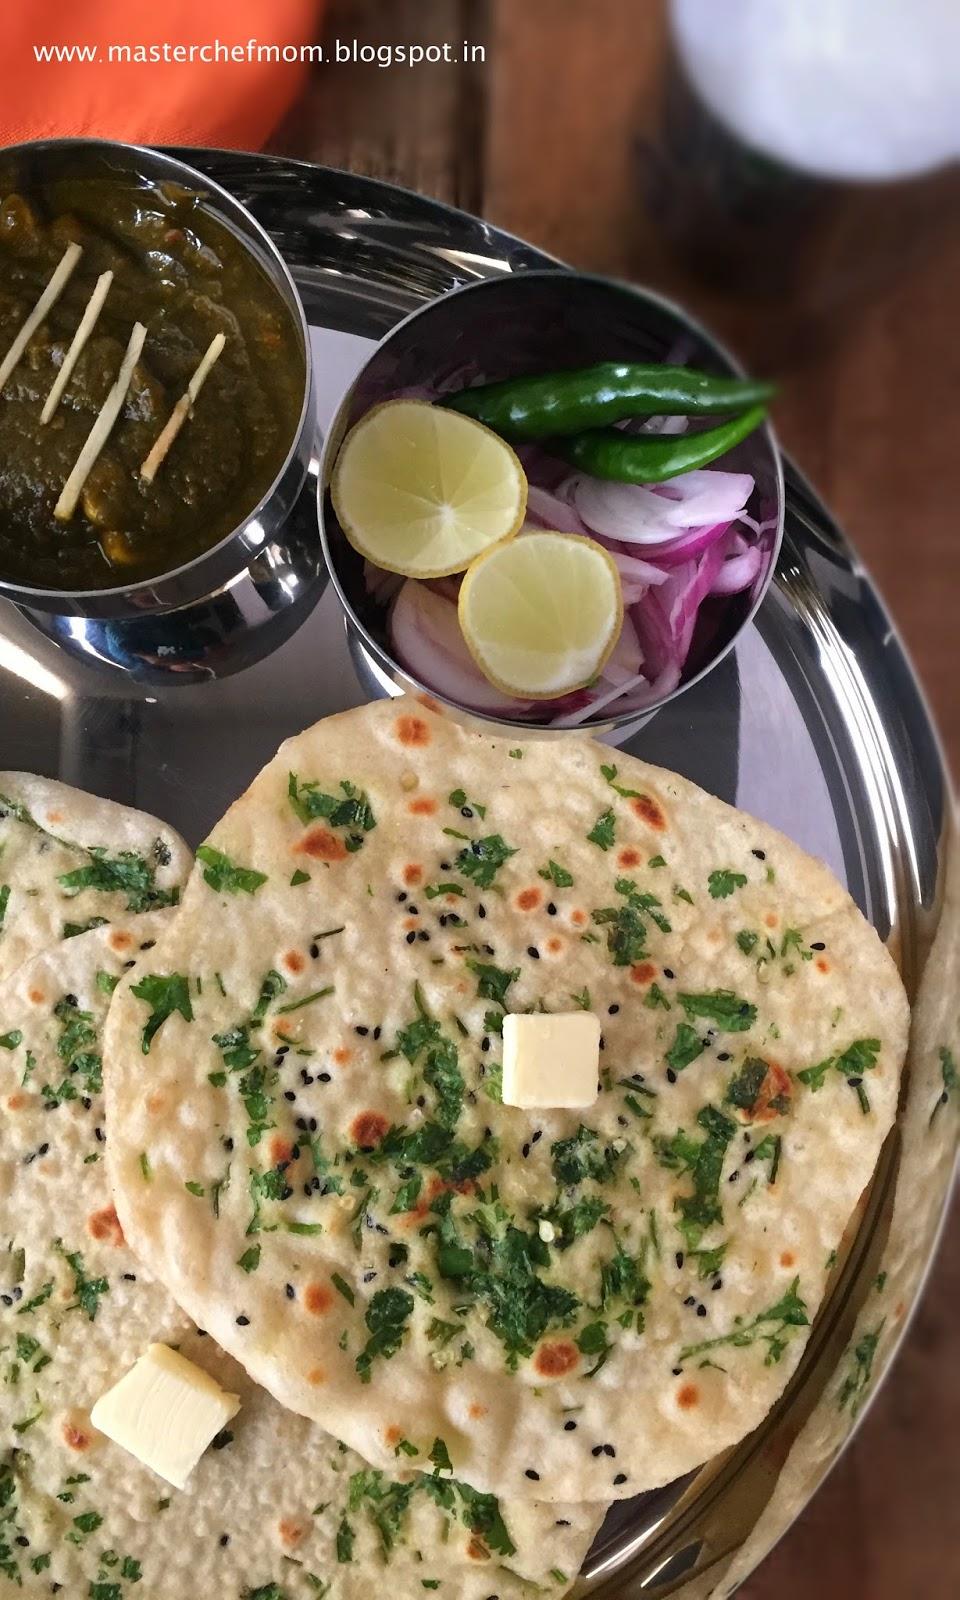 Masterchefmom amritsari kulcha speciality flatbreads for Amritsari cuisine